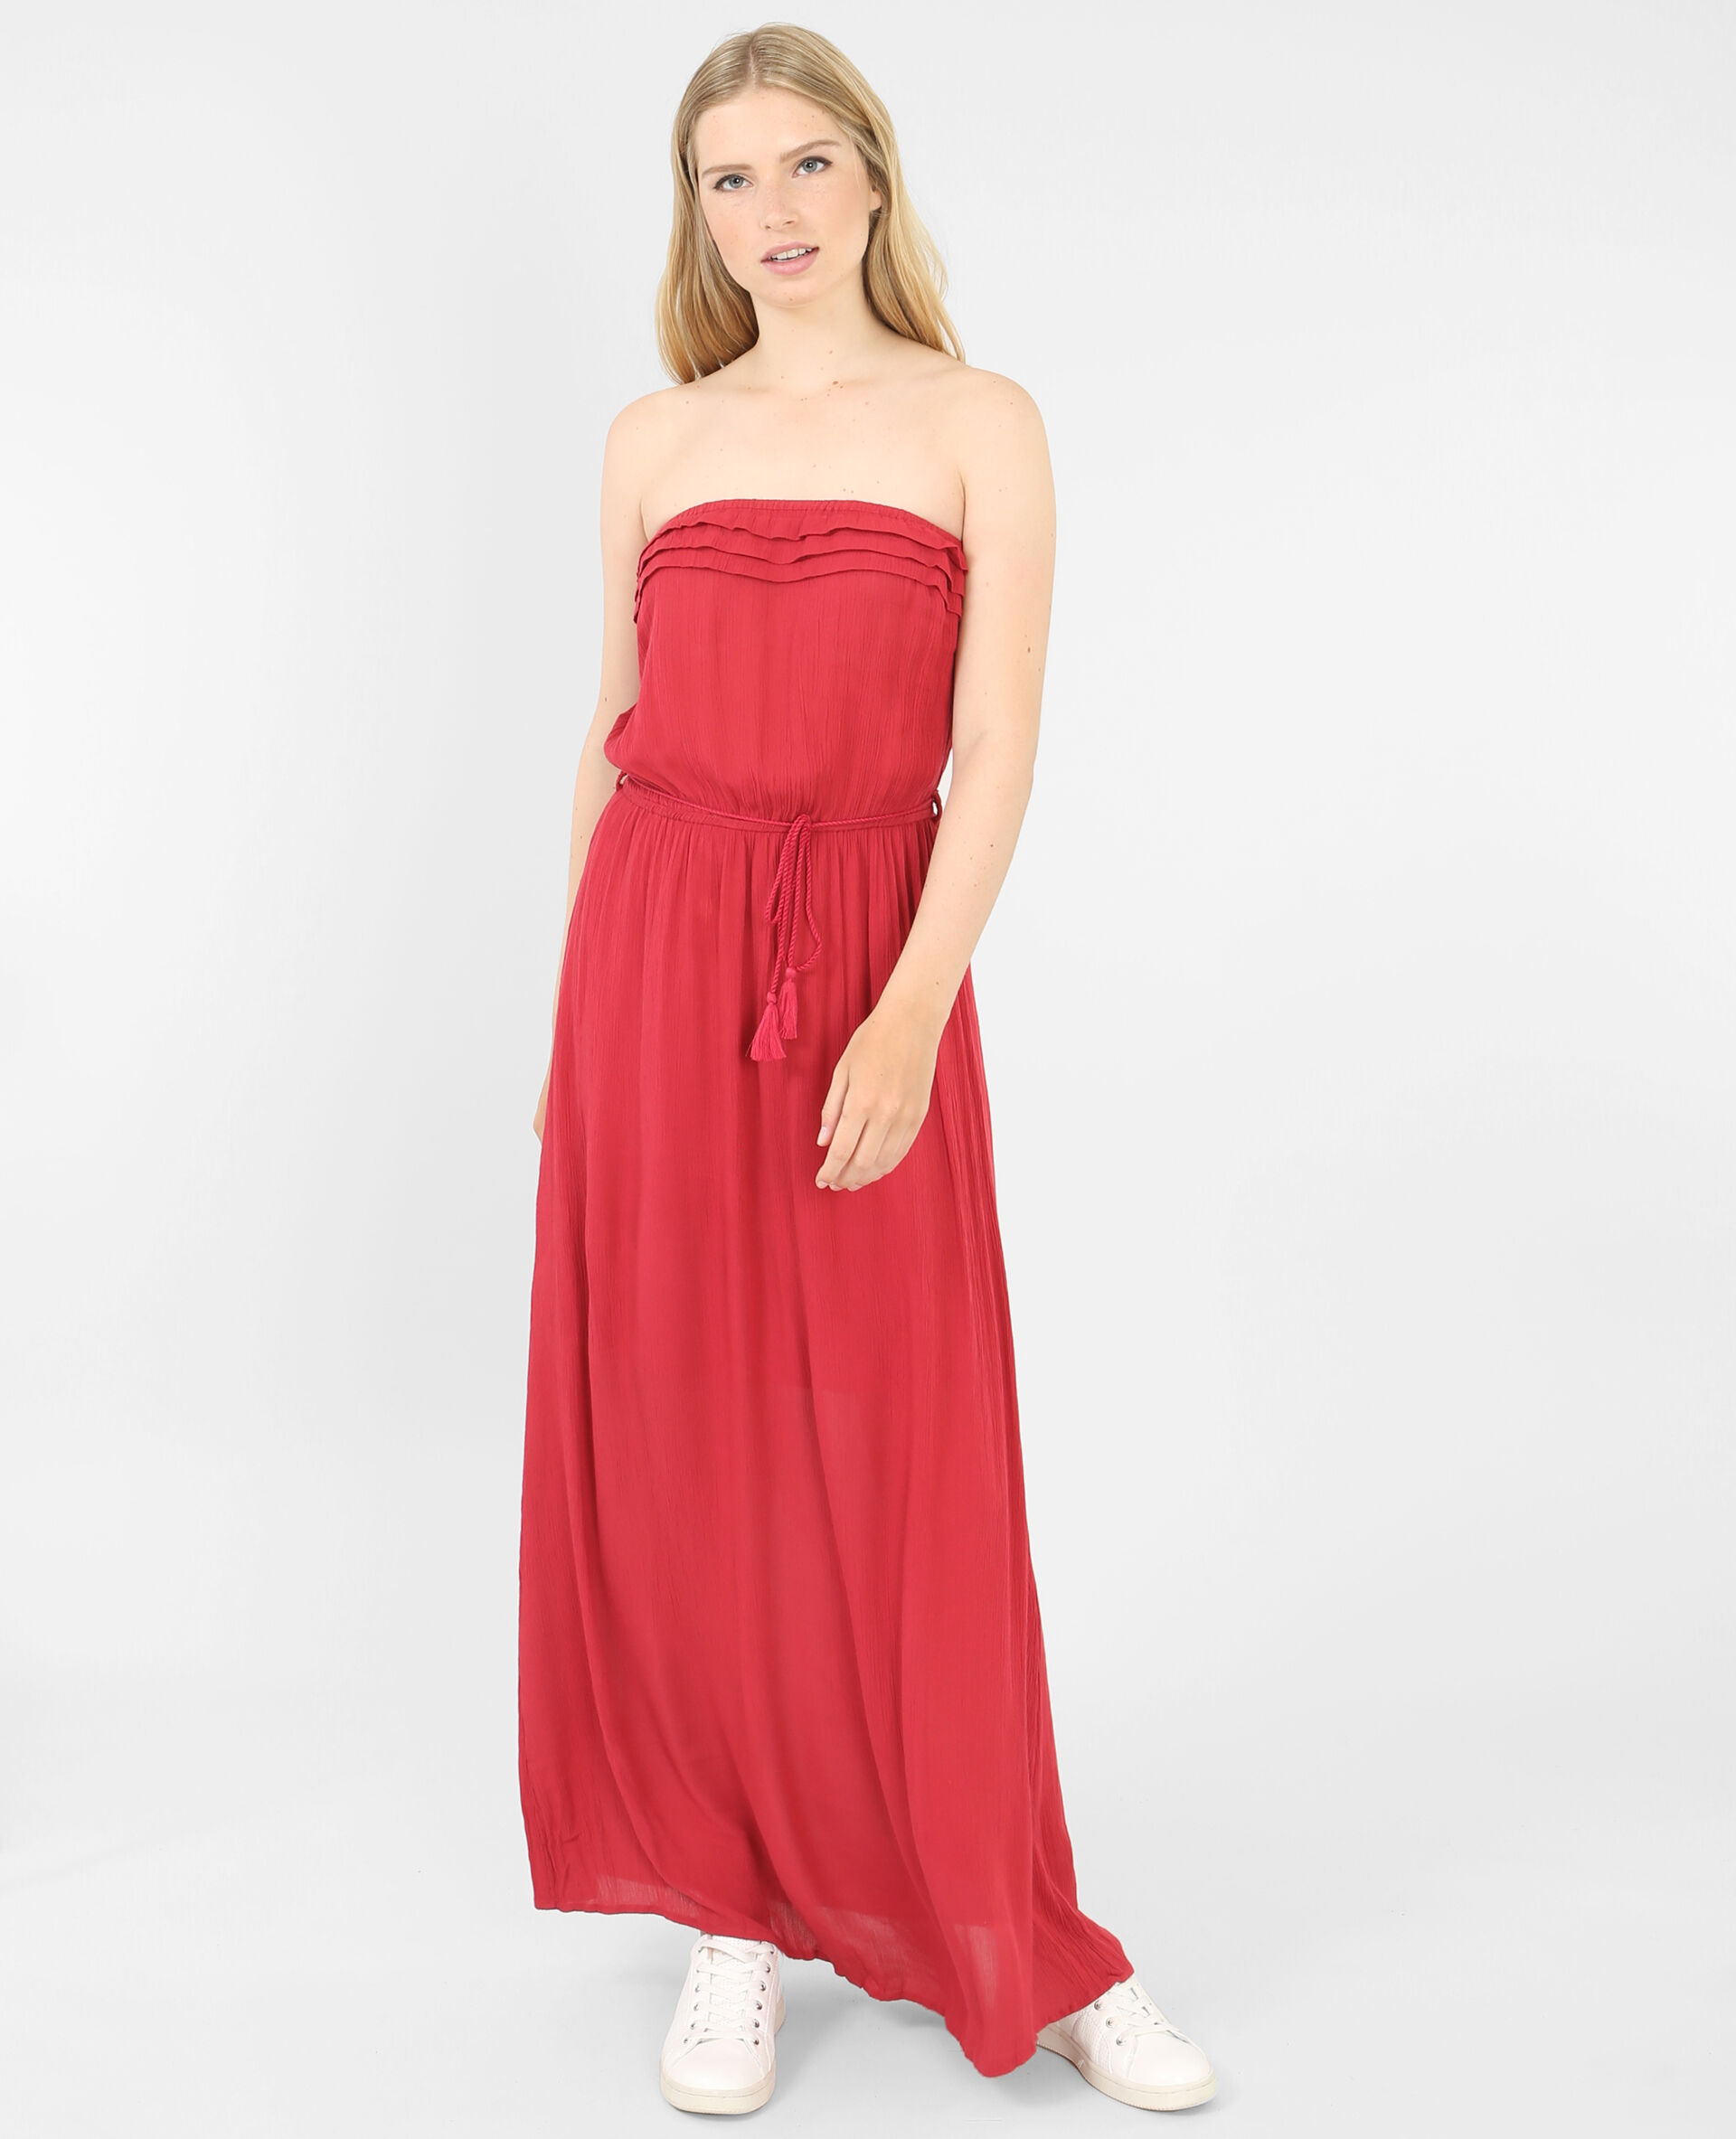 lange strapless jurk